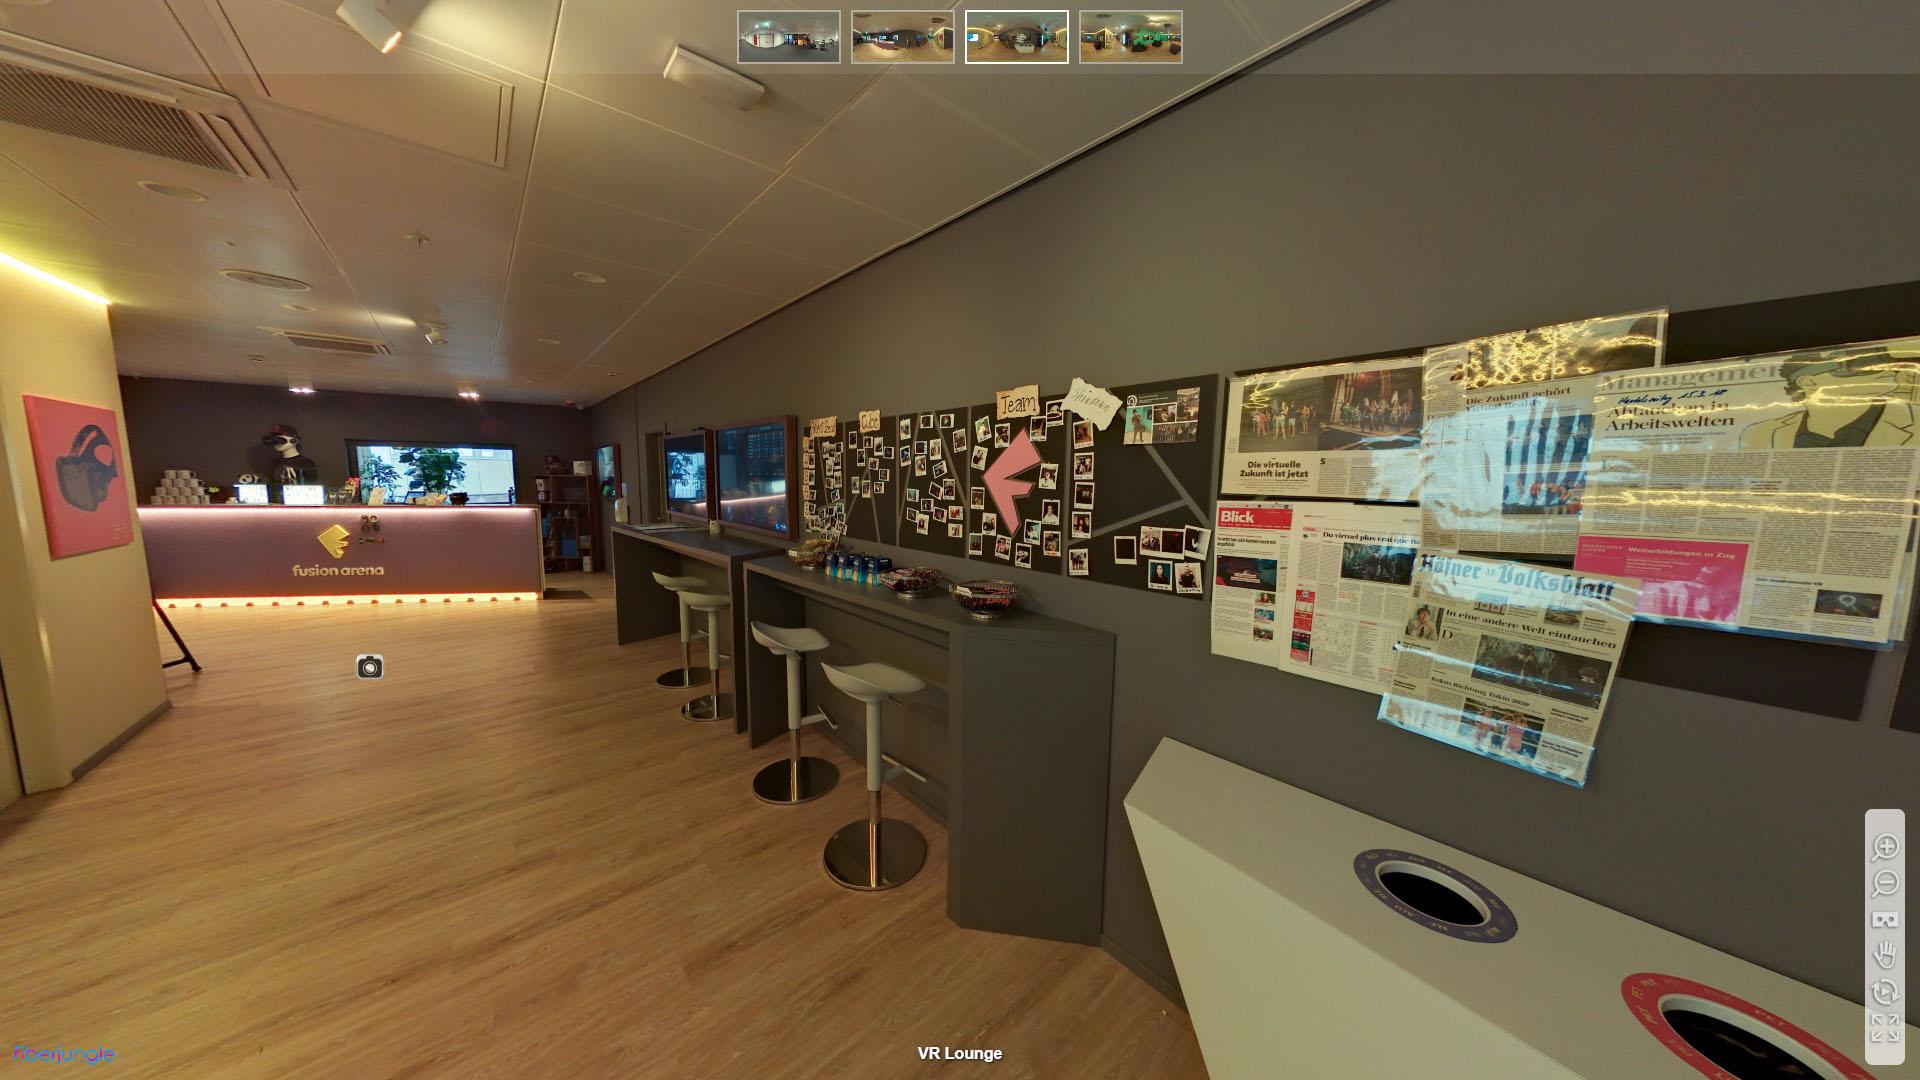 Fusion Arena Letzipark Zuerich Altstetten VR Lounge